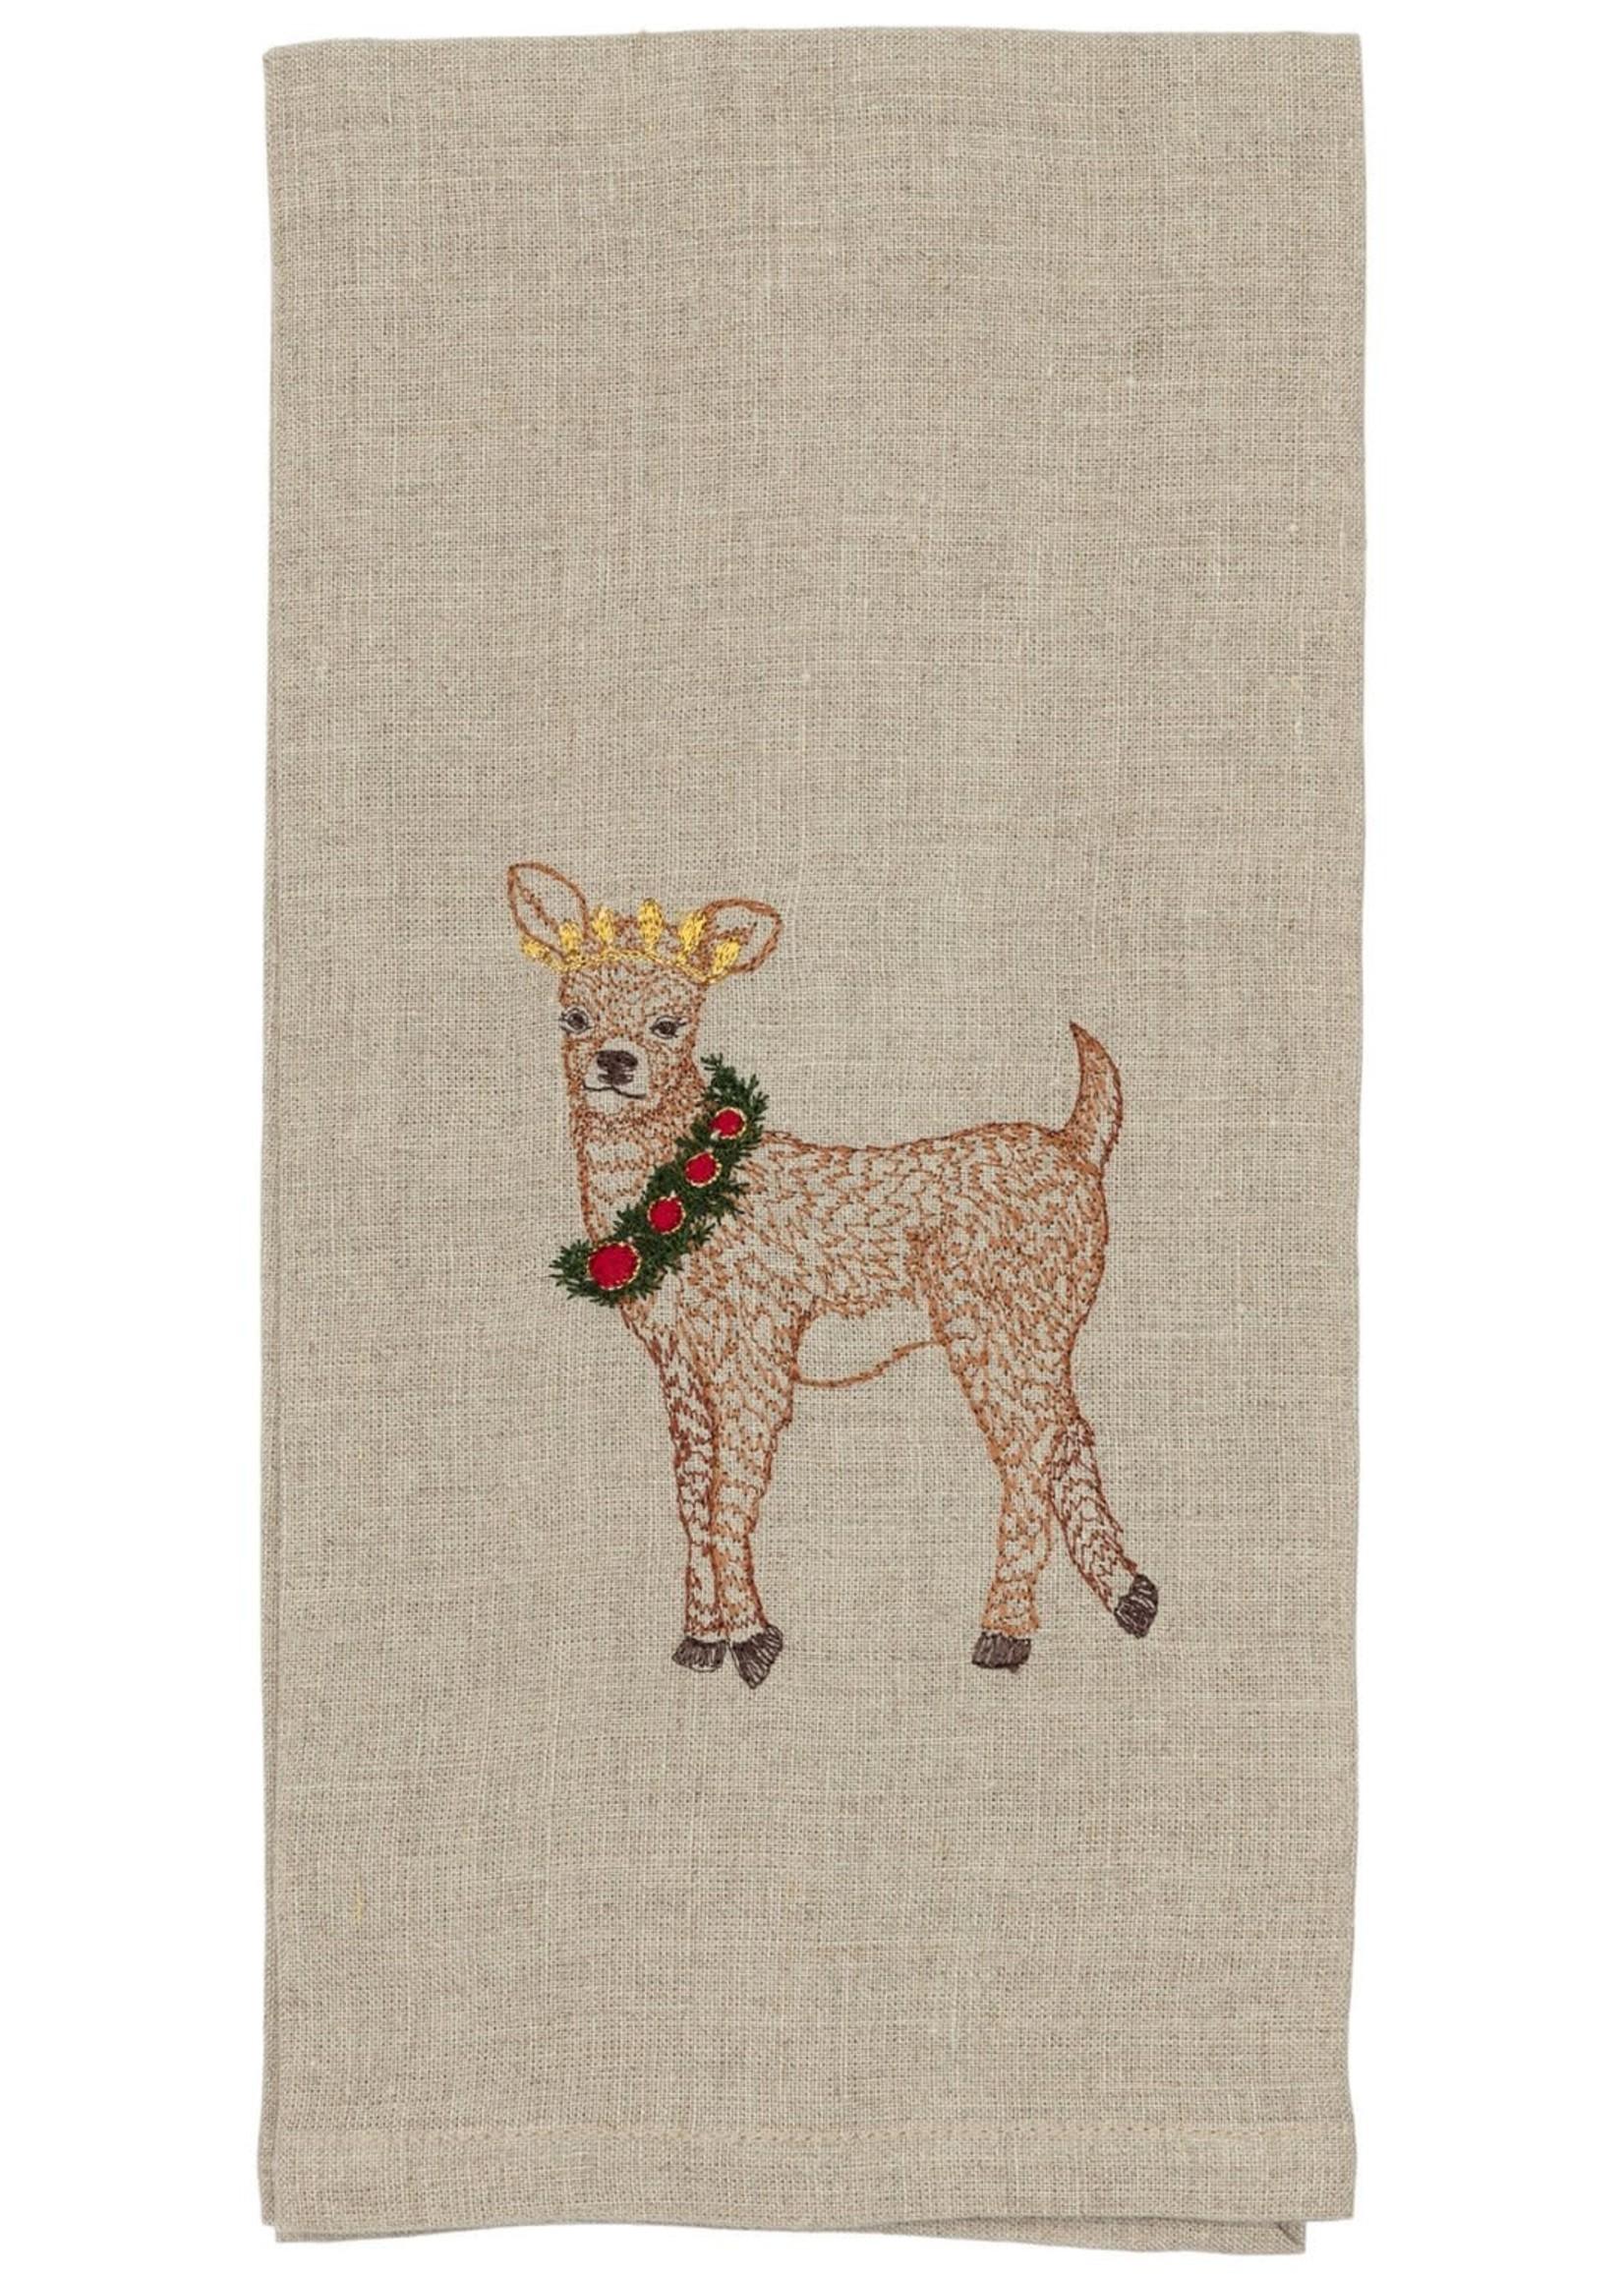 Coral and Tusk Tea Towel - Deer with Christmas Wreath